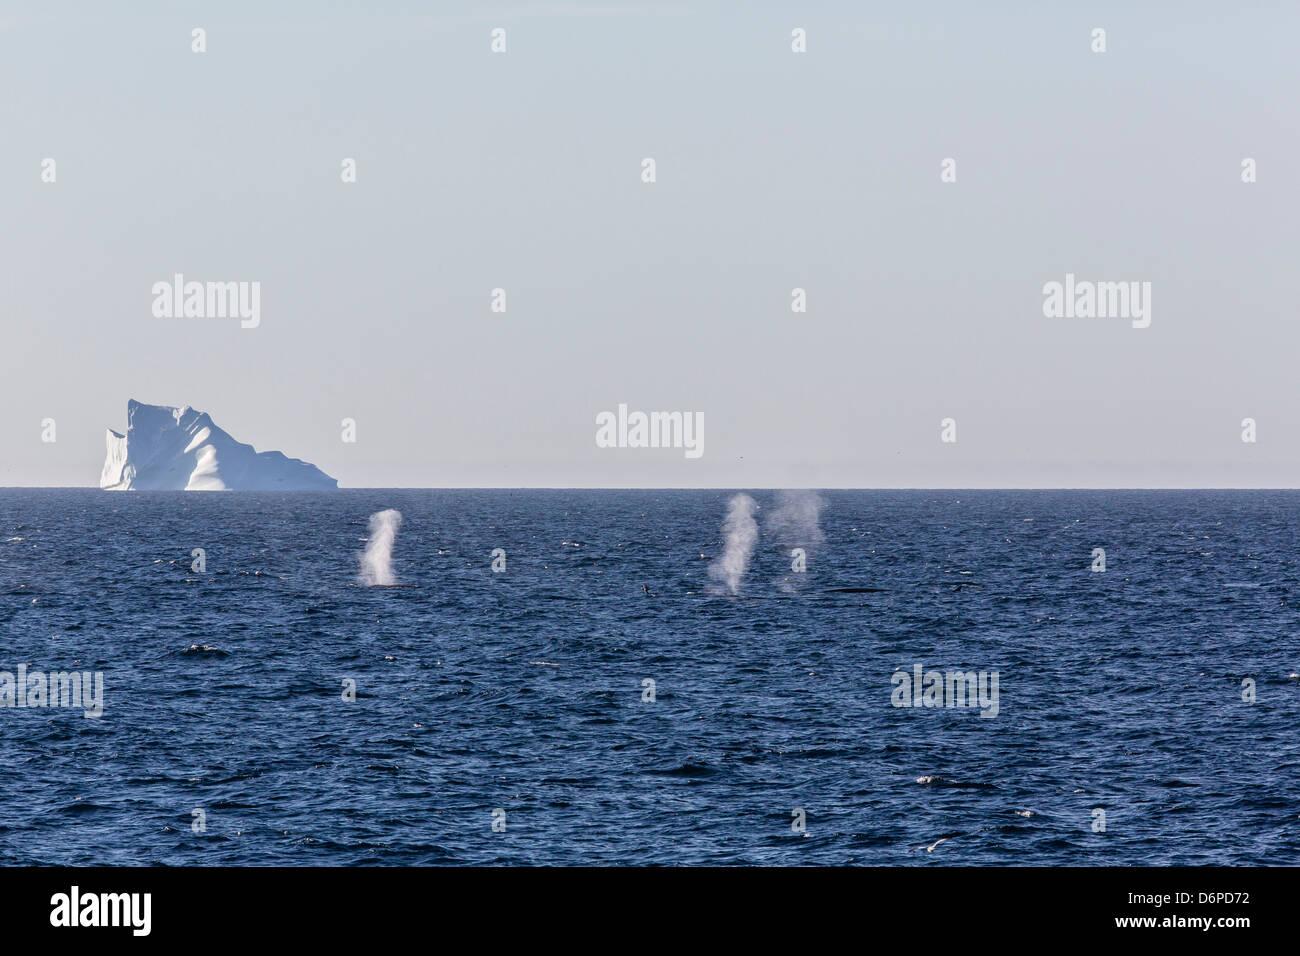 Fin whales (Balaenoptera physalus), Vikingbukta, Northeast Greenland, Polar Regions - Stock Image